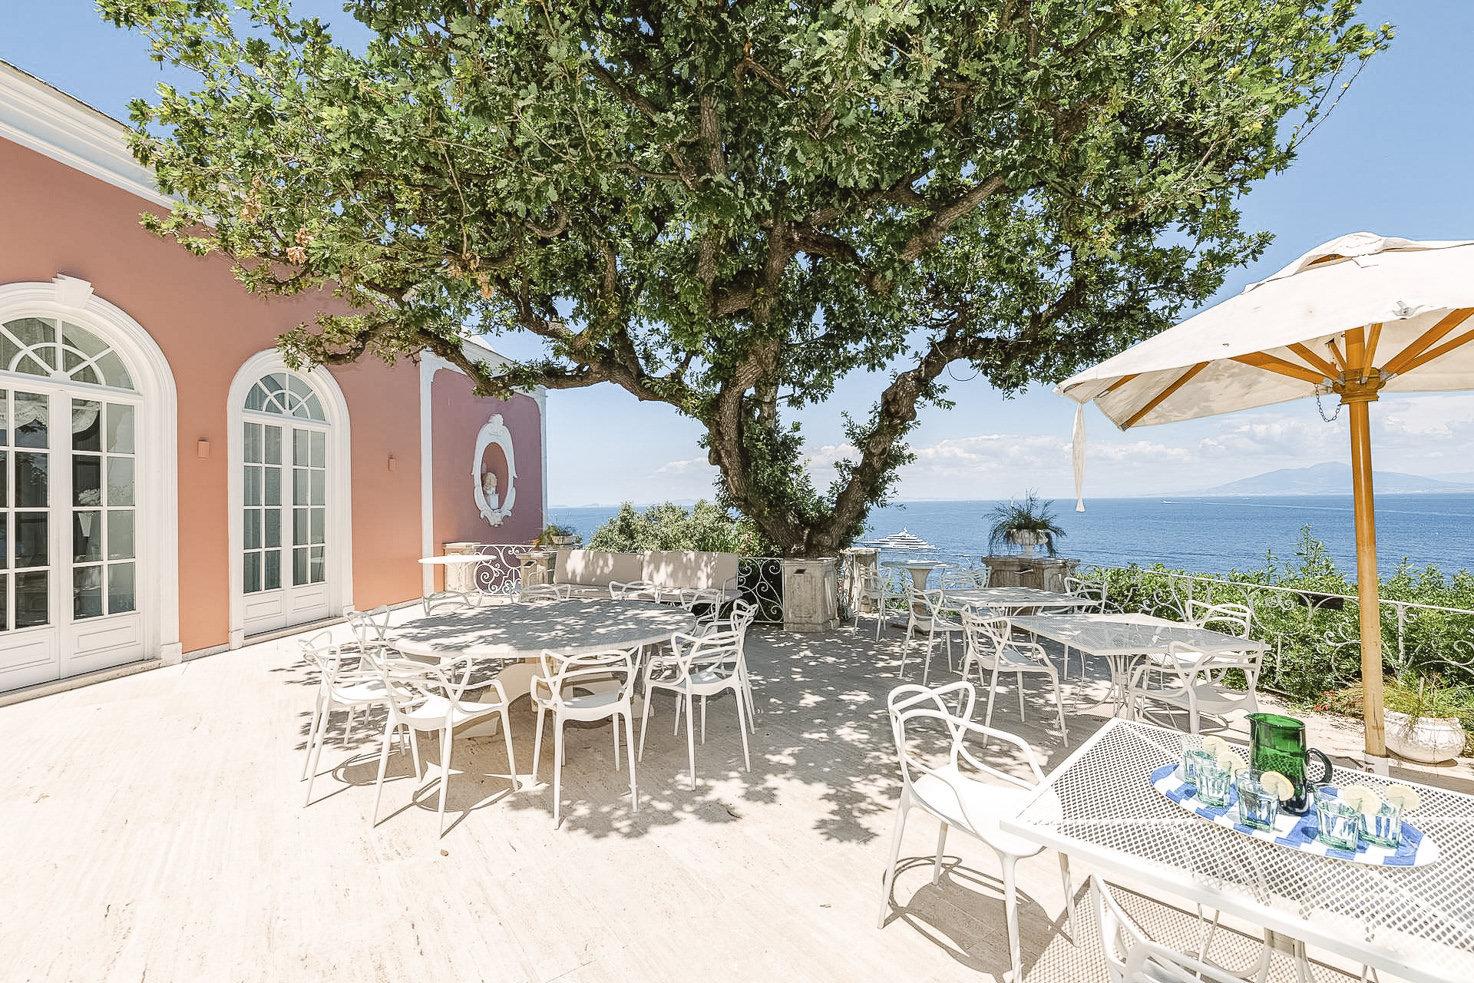 Main terrace of Villa Camelia